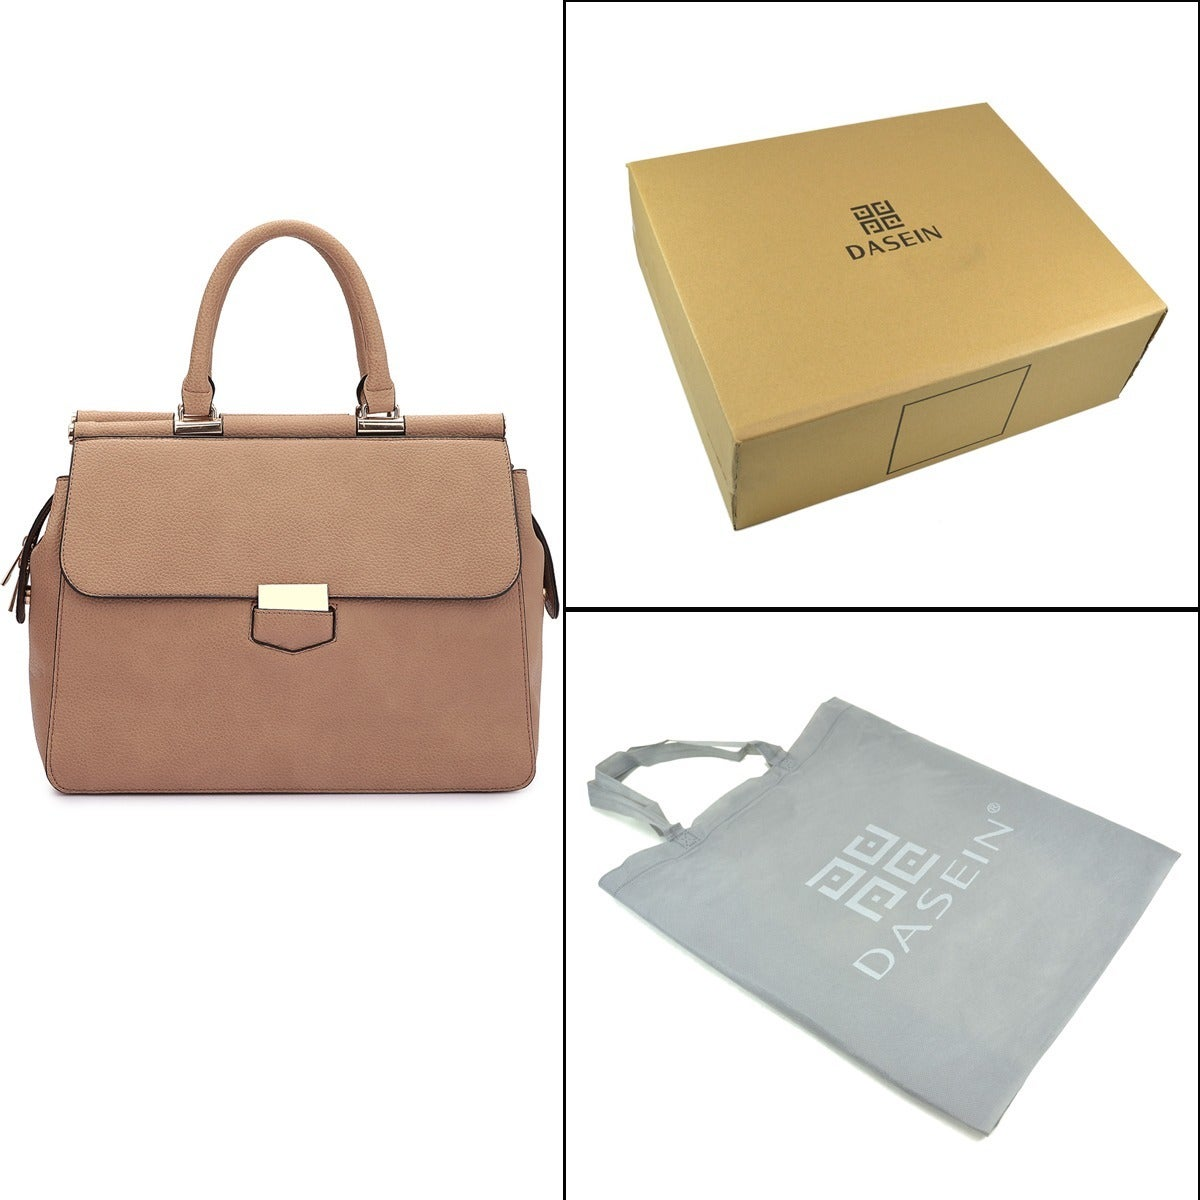 9a6fc53d300b Shop Dasein Expandable Side Zipper Briefcase Satchel Handbag - Free  Shipping Today - Overstock - 13180619